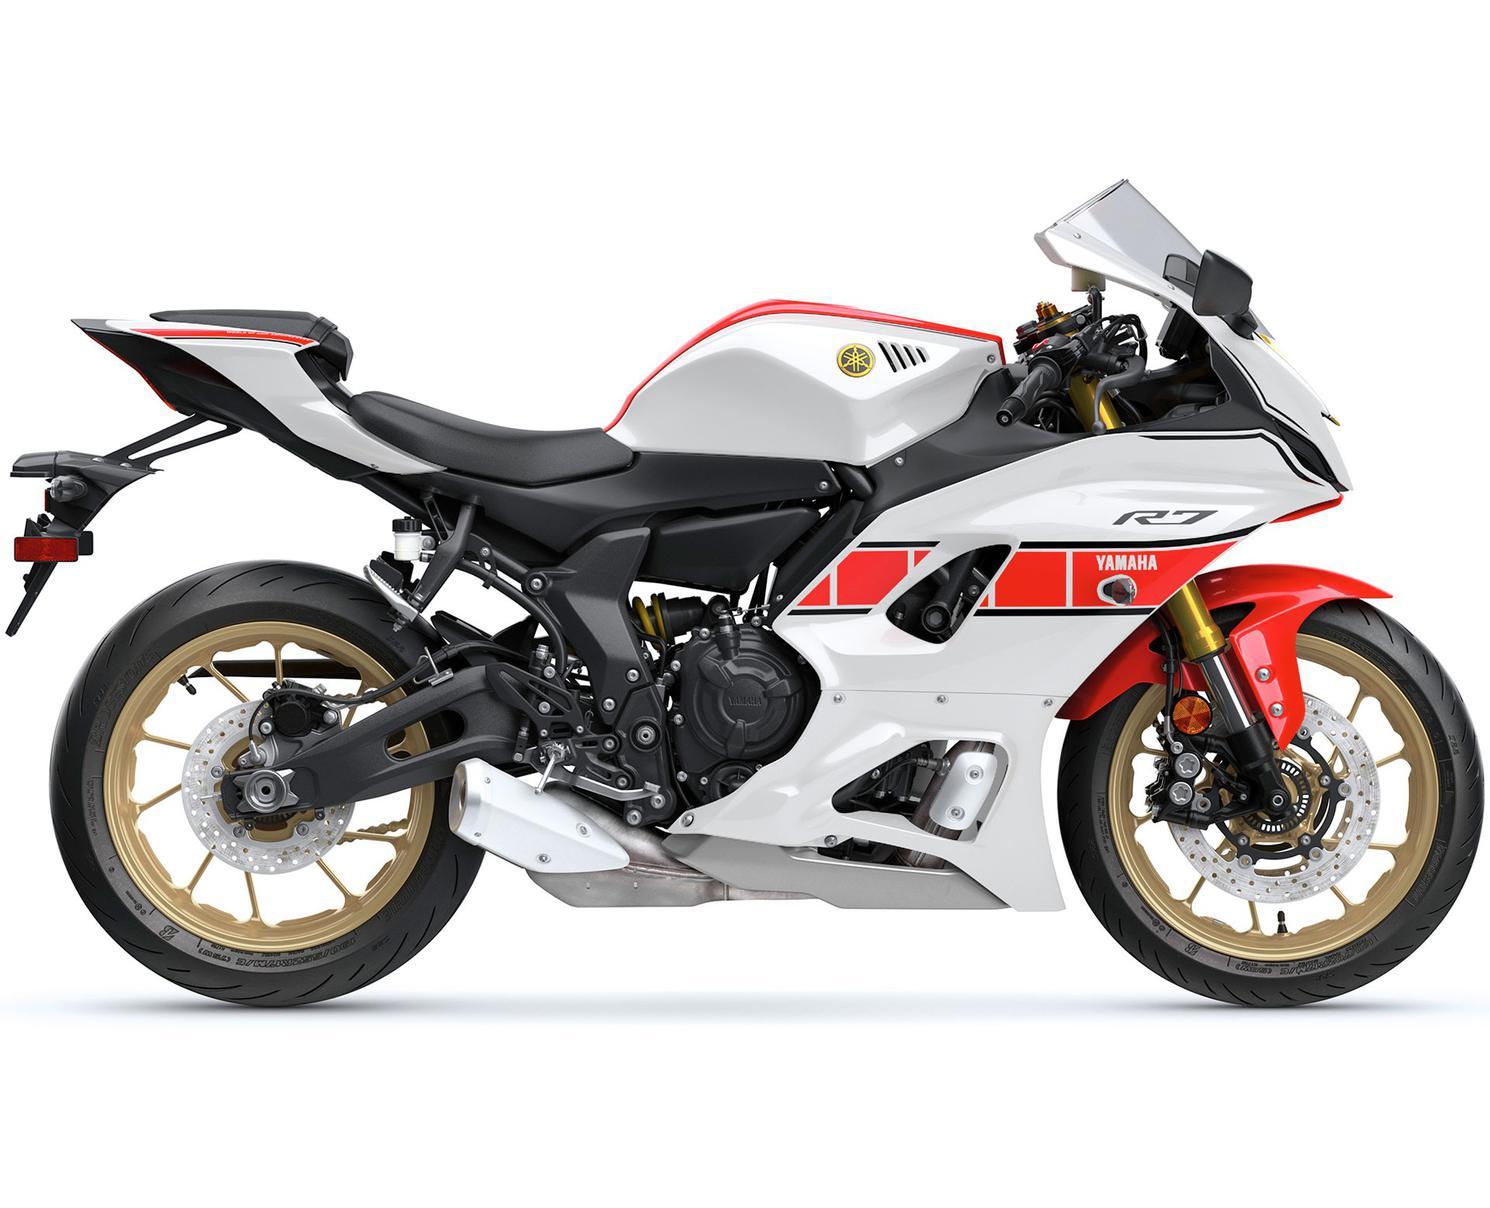 2022 Yamaha YZF-R7 World Gp 60Th Anniversary Edition